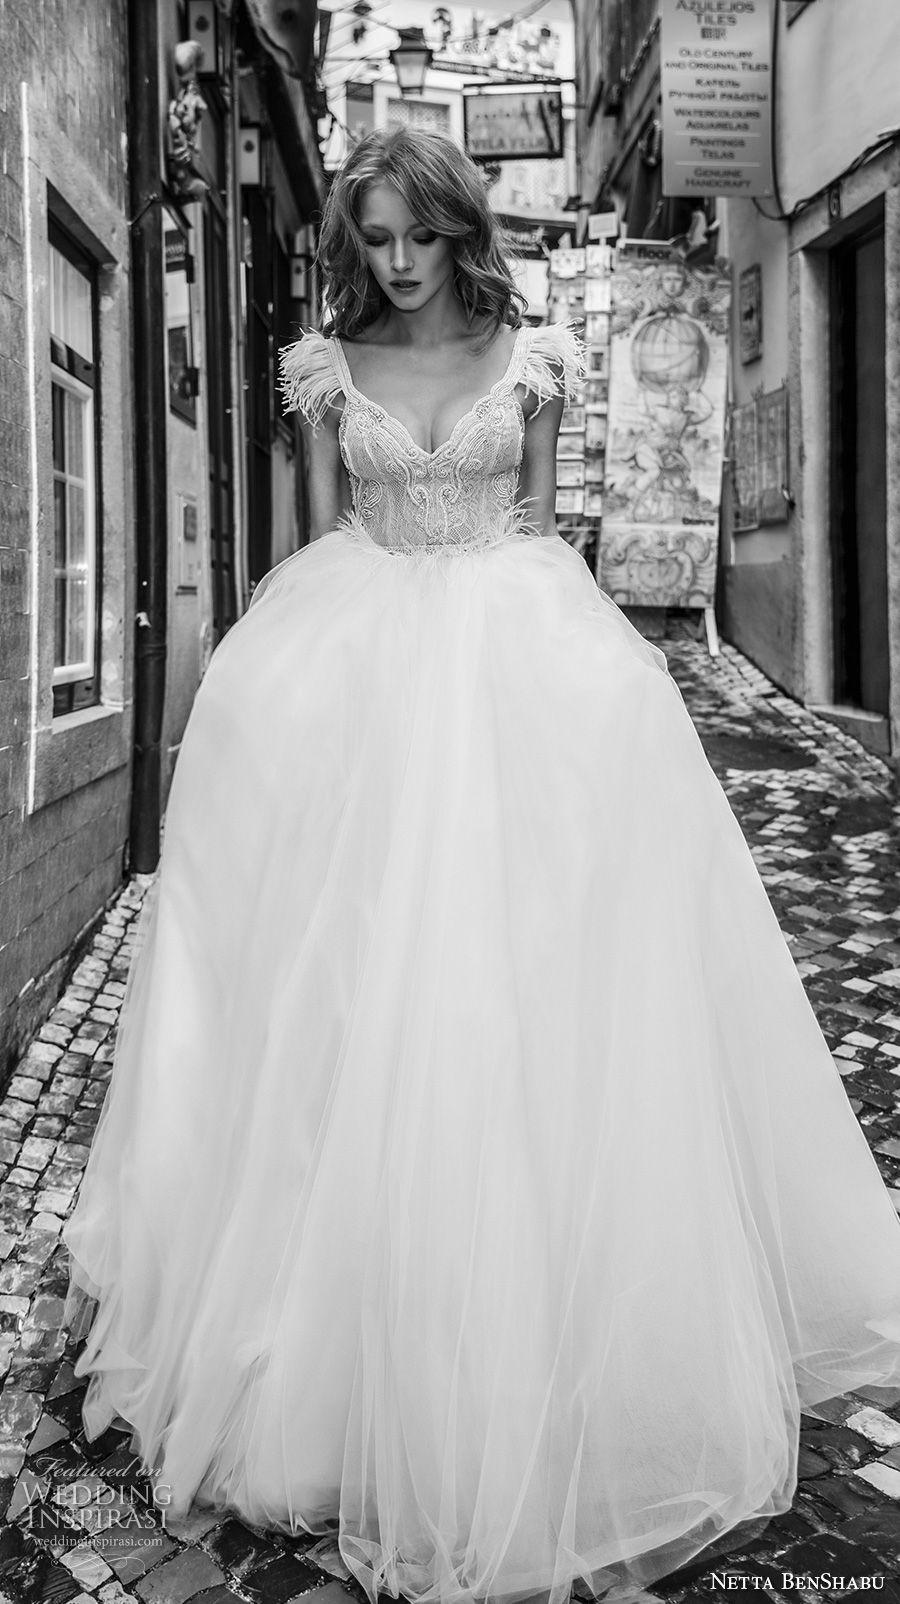 netta benshabu 2017 bridal cap sleeves sweetheart neckline heavily embellished bodice princess ball gown wedding dress open back chapel train (19) mv